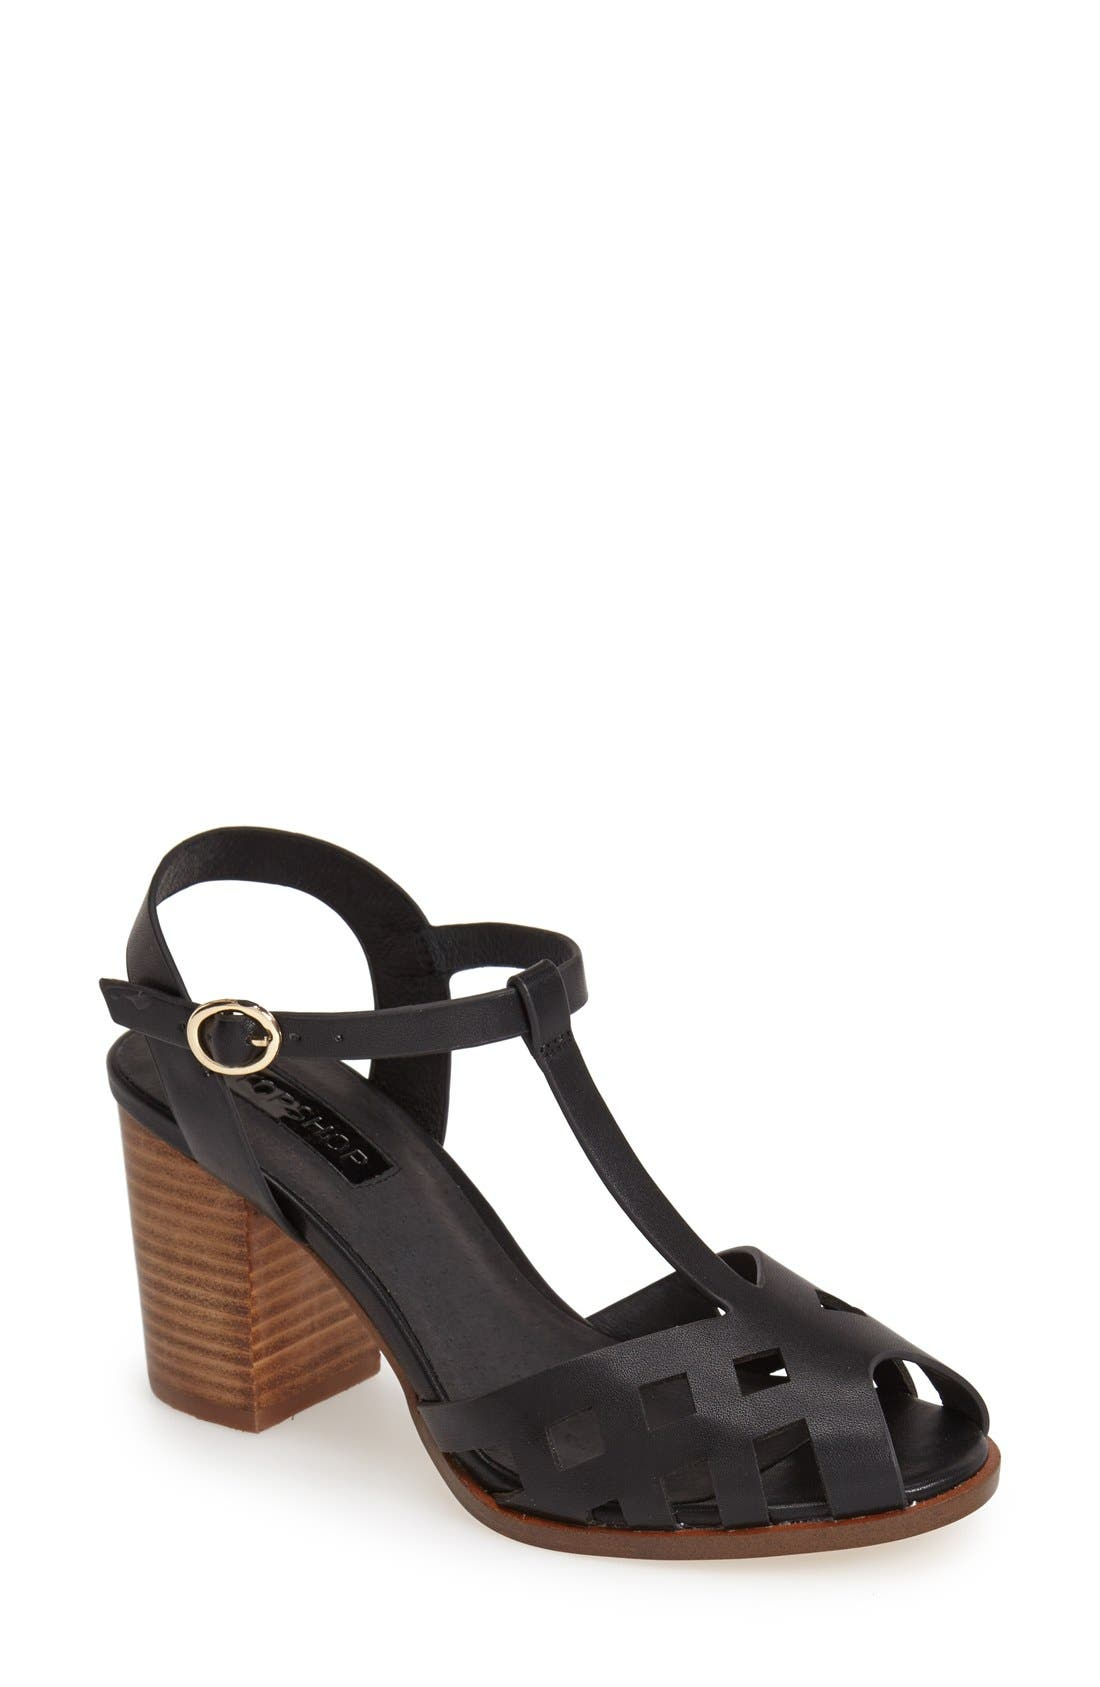 Main Image - Topshop 'Newlywed' T-Strap Peep Toe Sandal (Women)